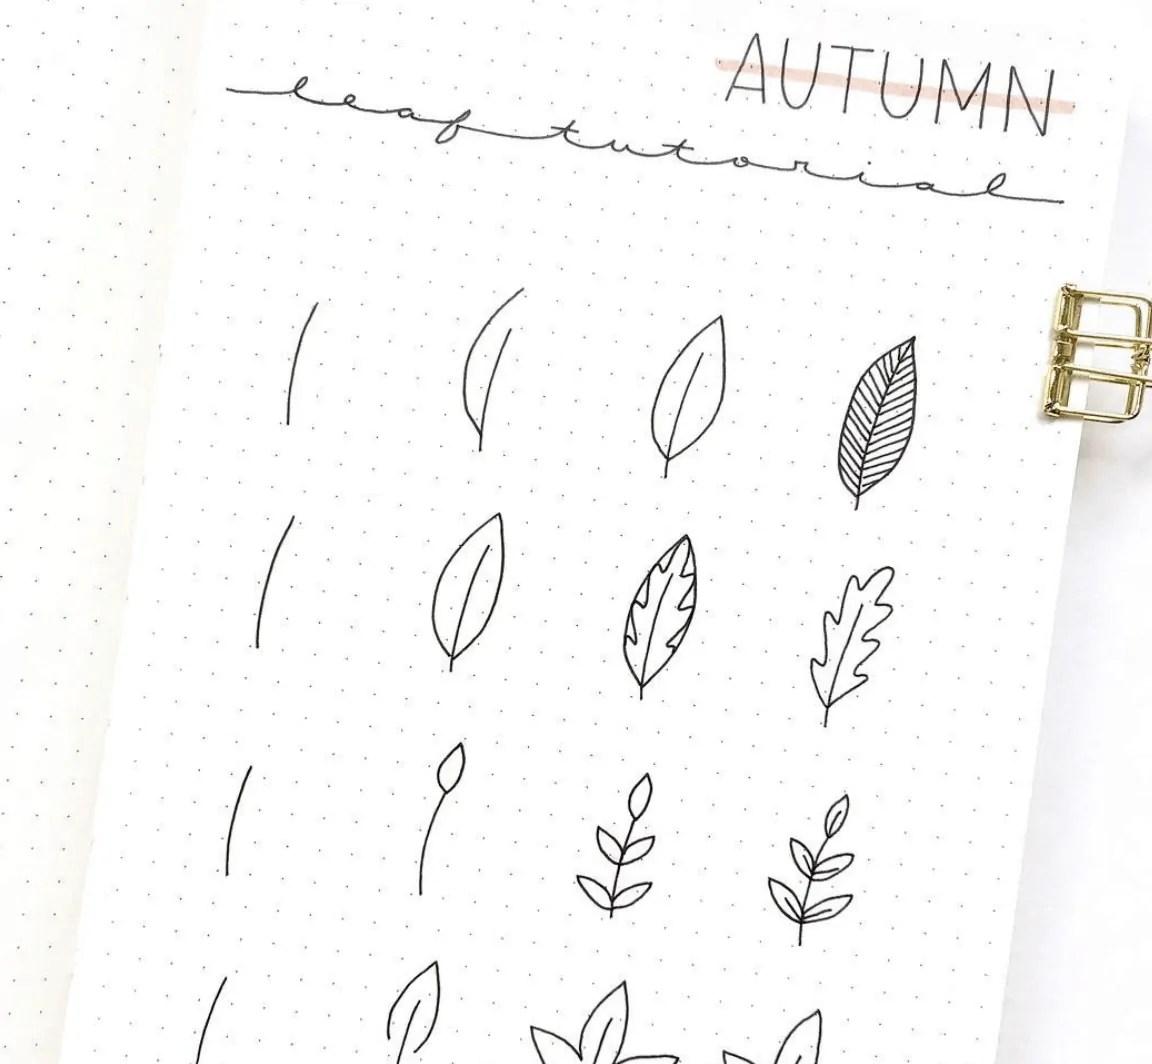 50+ Stunning September Bullet Journal Ideas you must see! 143